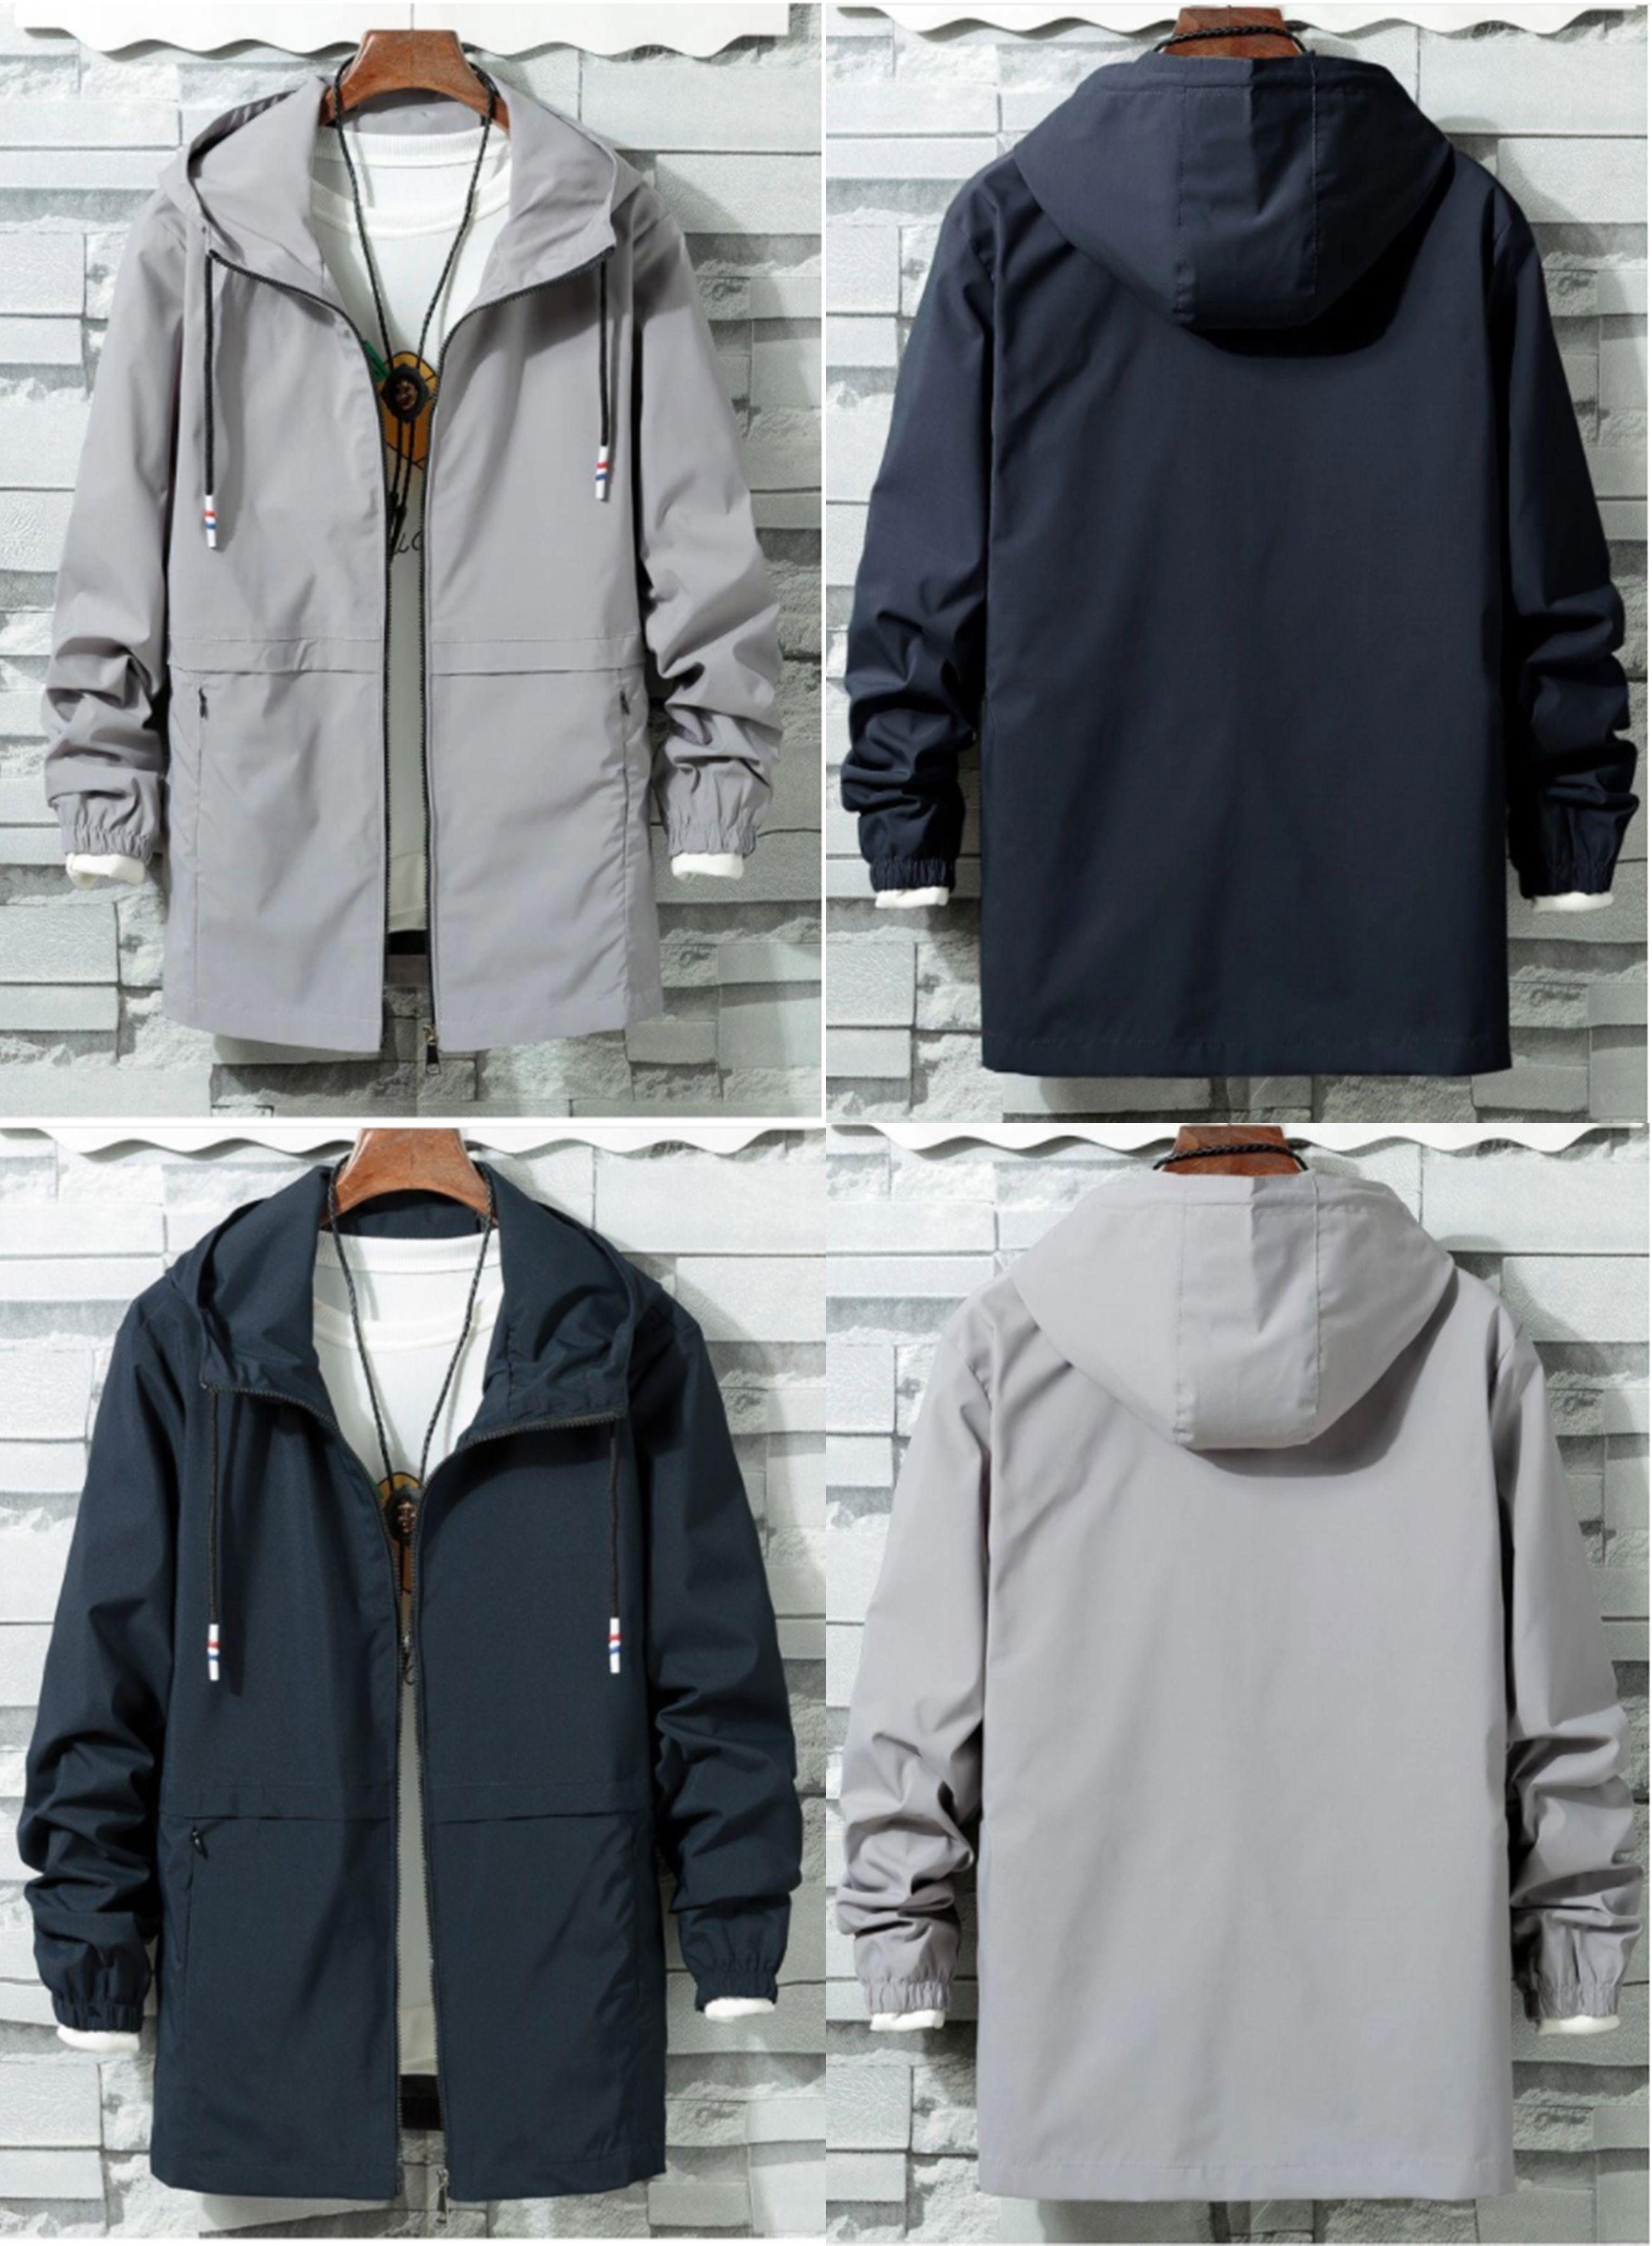 Men S Hooded Jacket Long Sleeve Style Products Sports Jacket Windbreaker Jacket Mens F Vintage Windbreaker Jacket Windbreaker Jacket Mens Jackets Men Fashion [ 3540 x 2604 Pixel ]